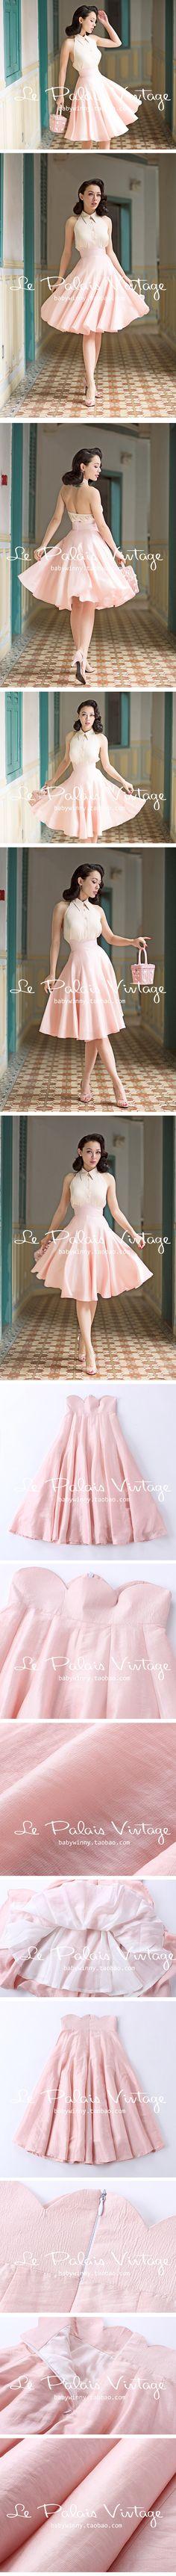 Classic 50s-style teatime dress with full skirt #lepalaisvintage